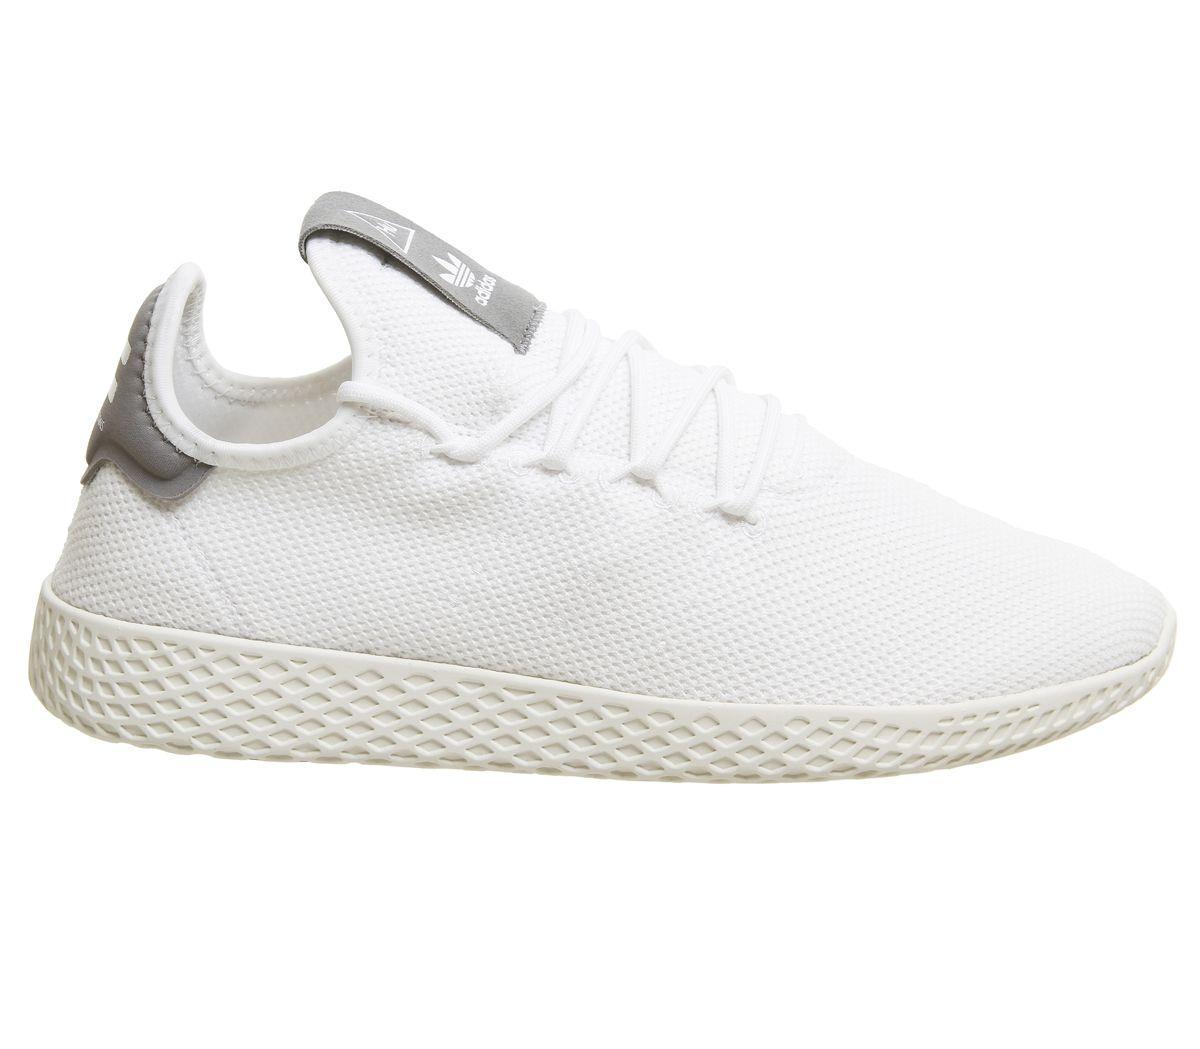 7dfee1e4d6838 Adidas - White Pw Tennis Trainers - Lyst. View fullscreen